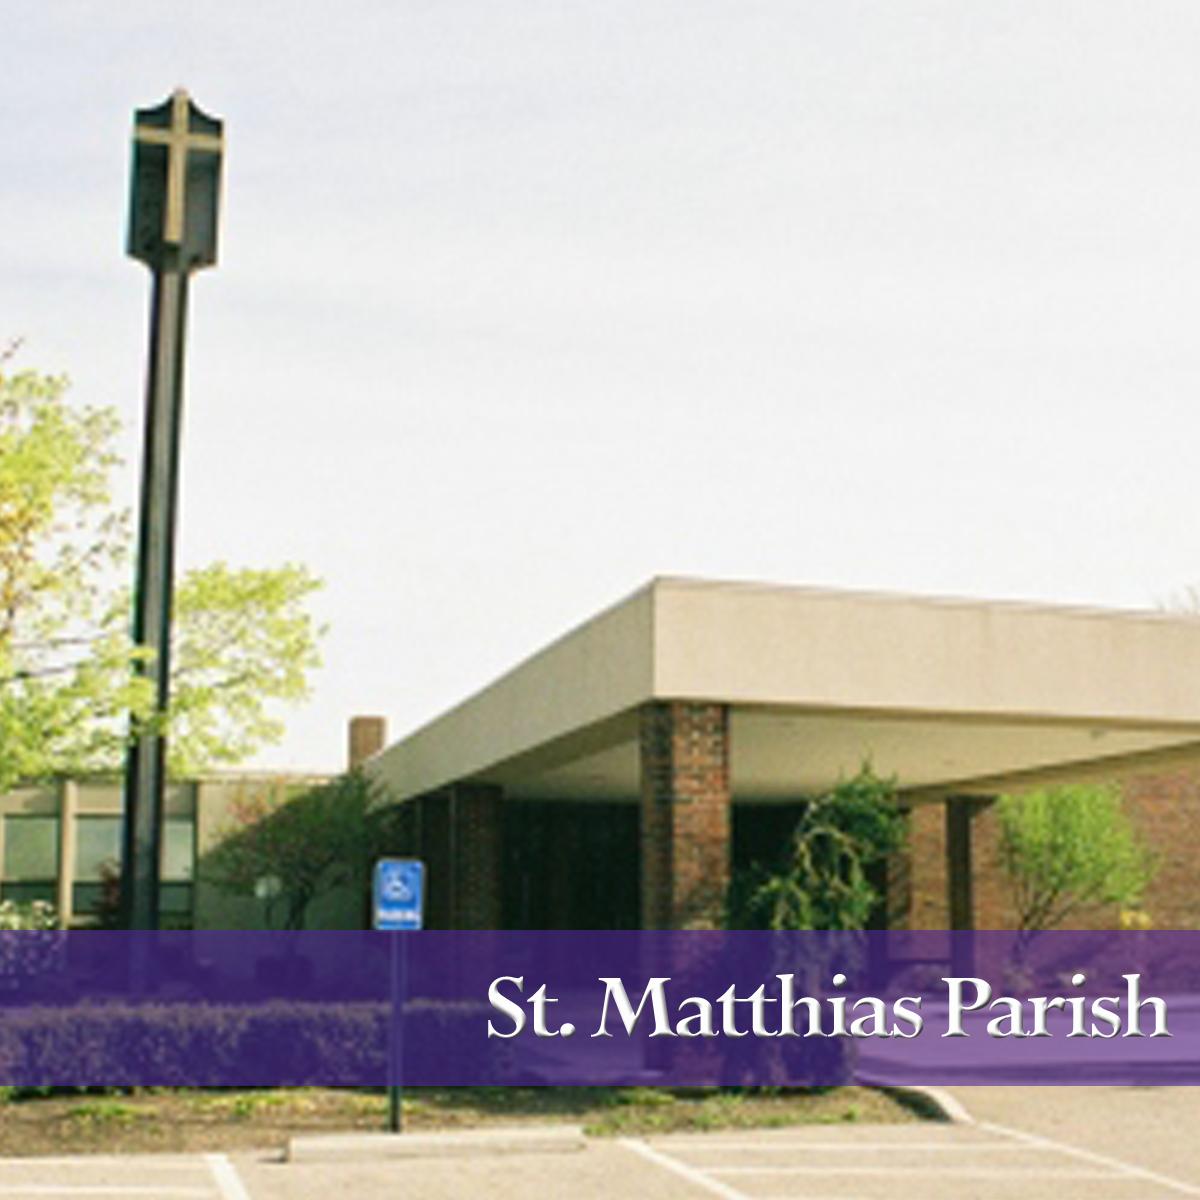 St. Matthias.jpg